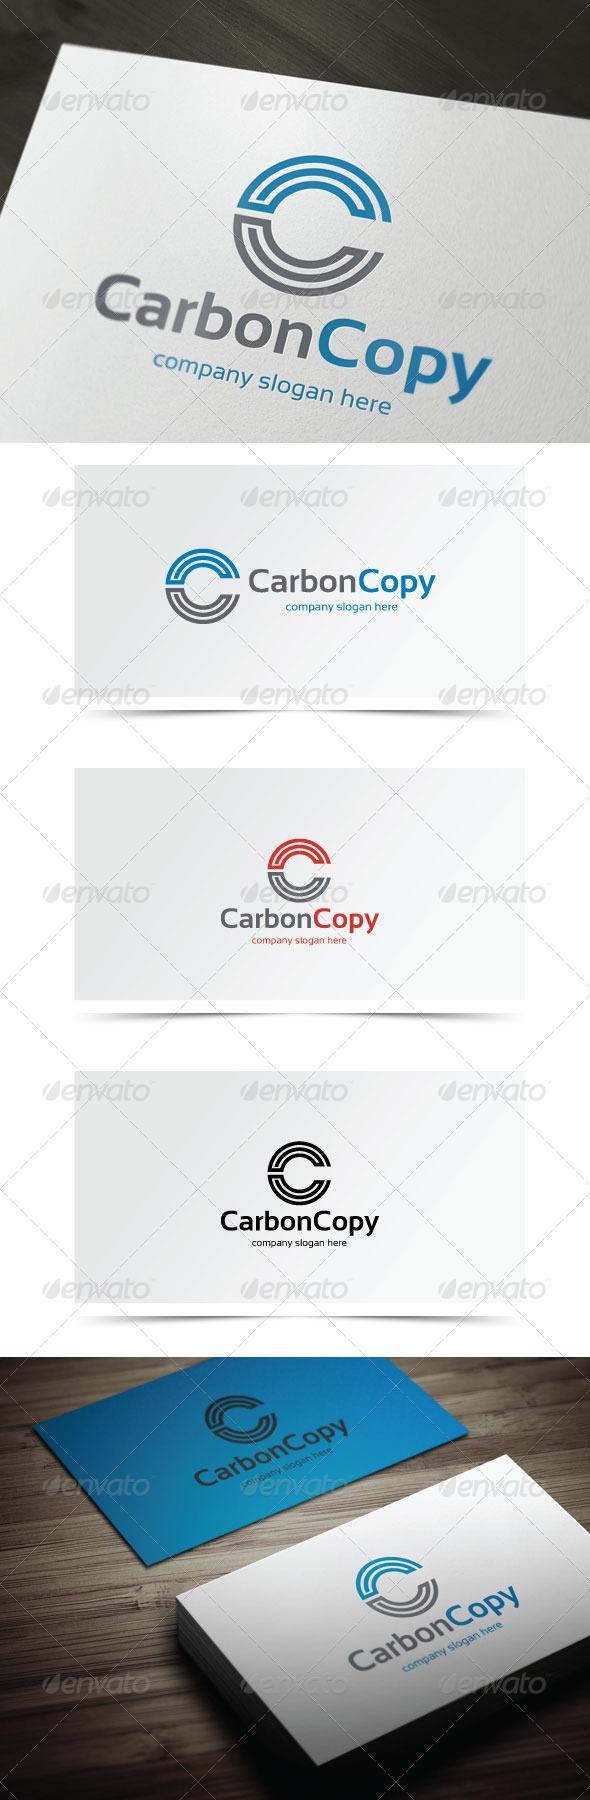 GraphicRiver Carbon Copy 6397669